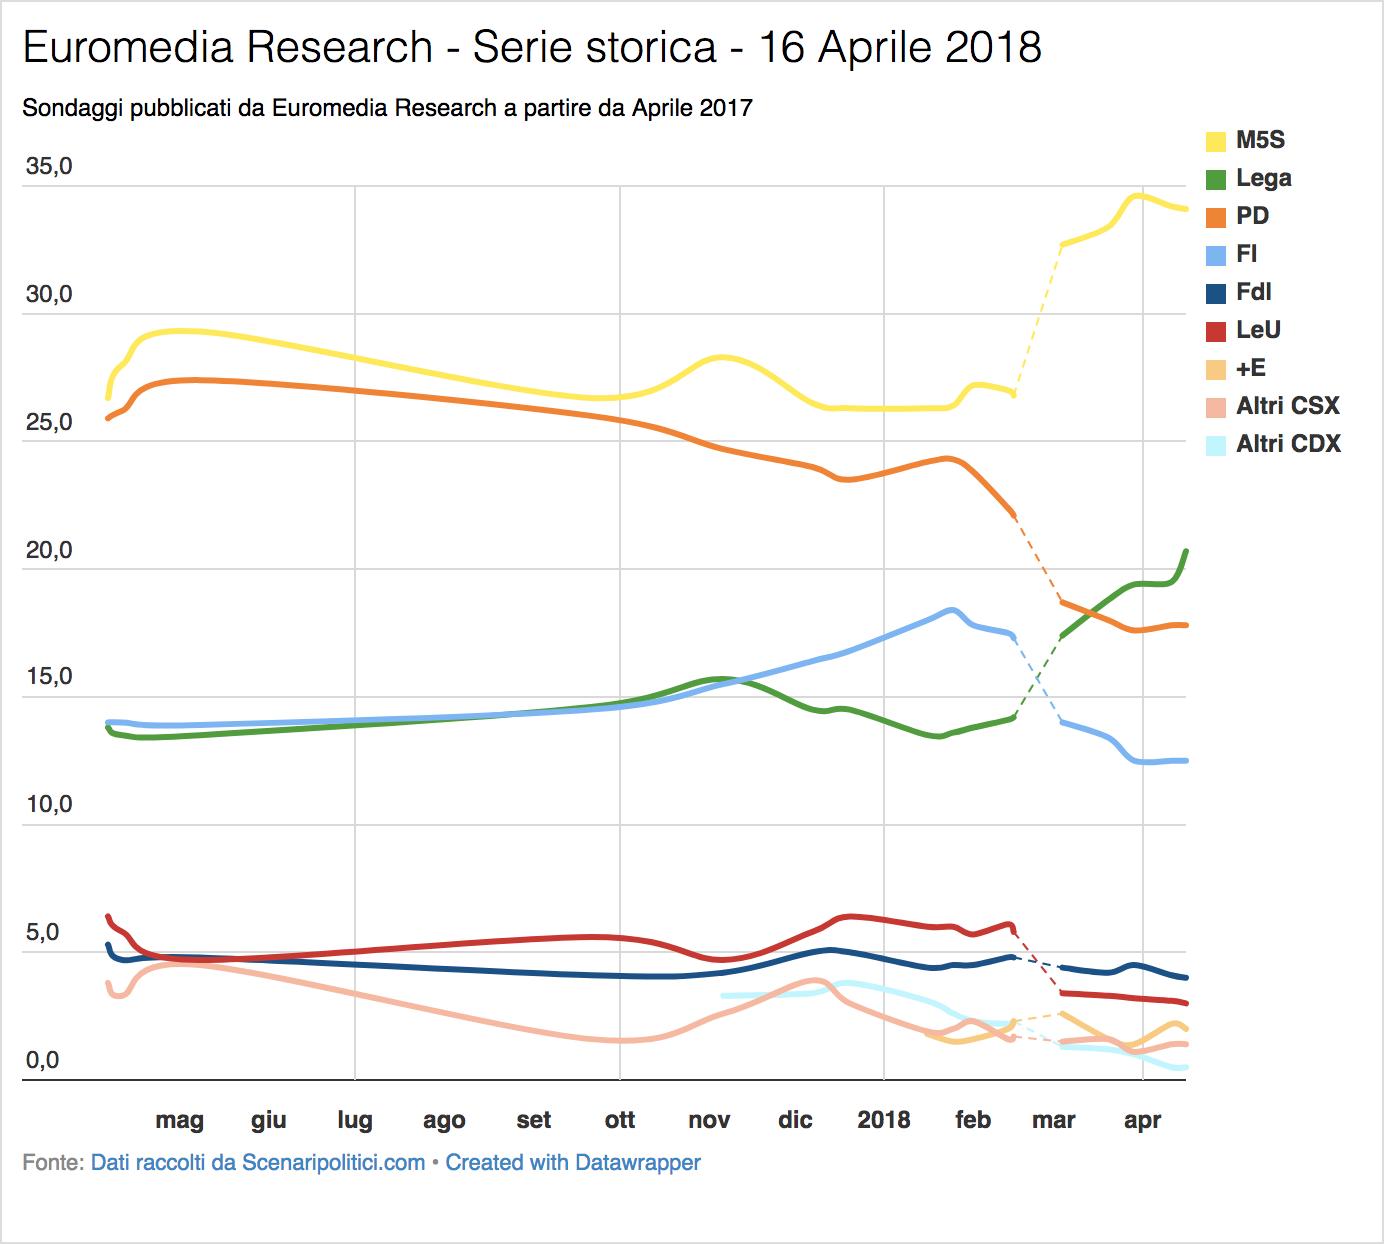 Sondaggio euromedia research 16 aprile 2018 ccuart Image collections